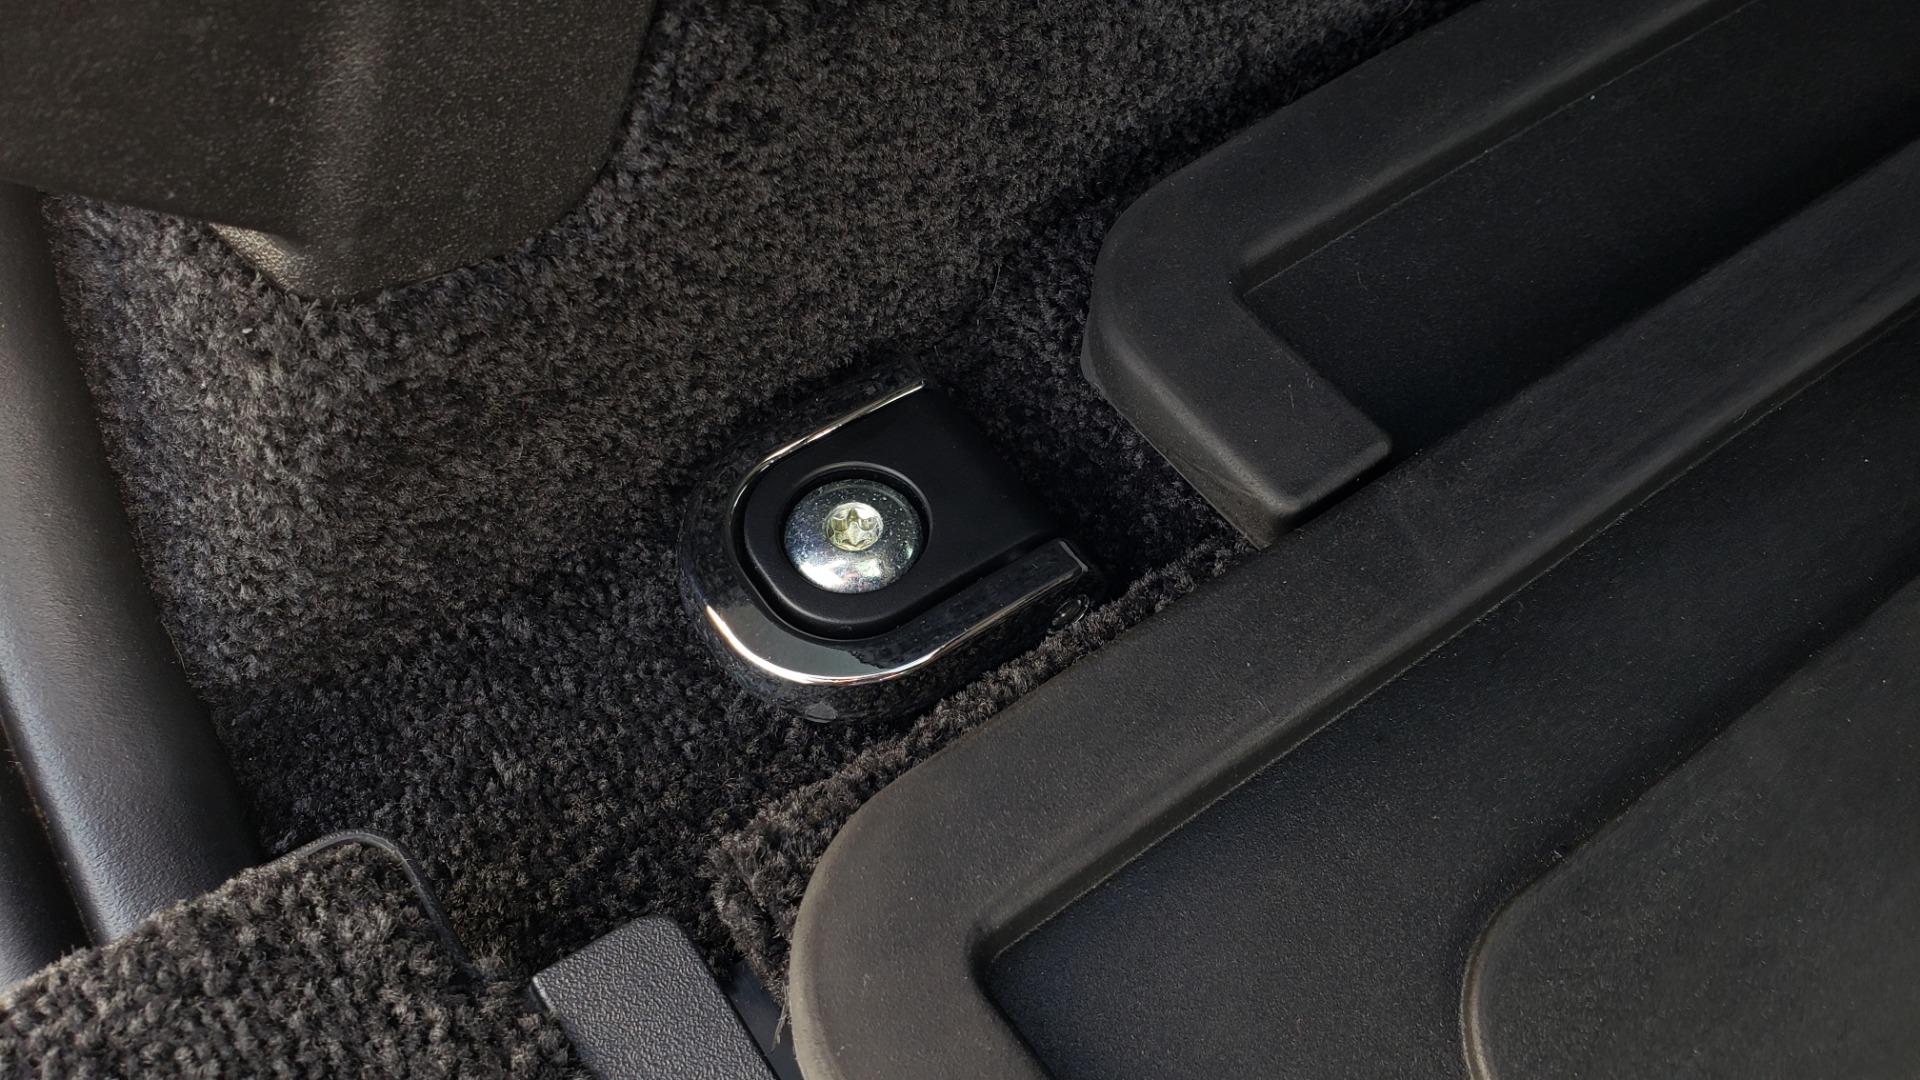 Used 2017 Land Rover RANGE ROVER SC V8 / VISION ASST / DRIVE PKG / MERIDIAN SOUND / PANO-ROOF / NAV / BSM for sale $75,995 at Formula Imports in Charlotte NC 28227 20